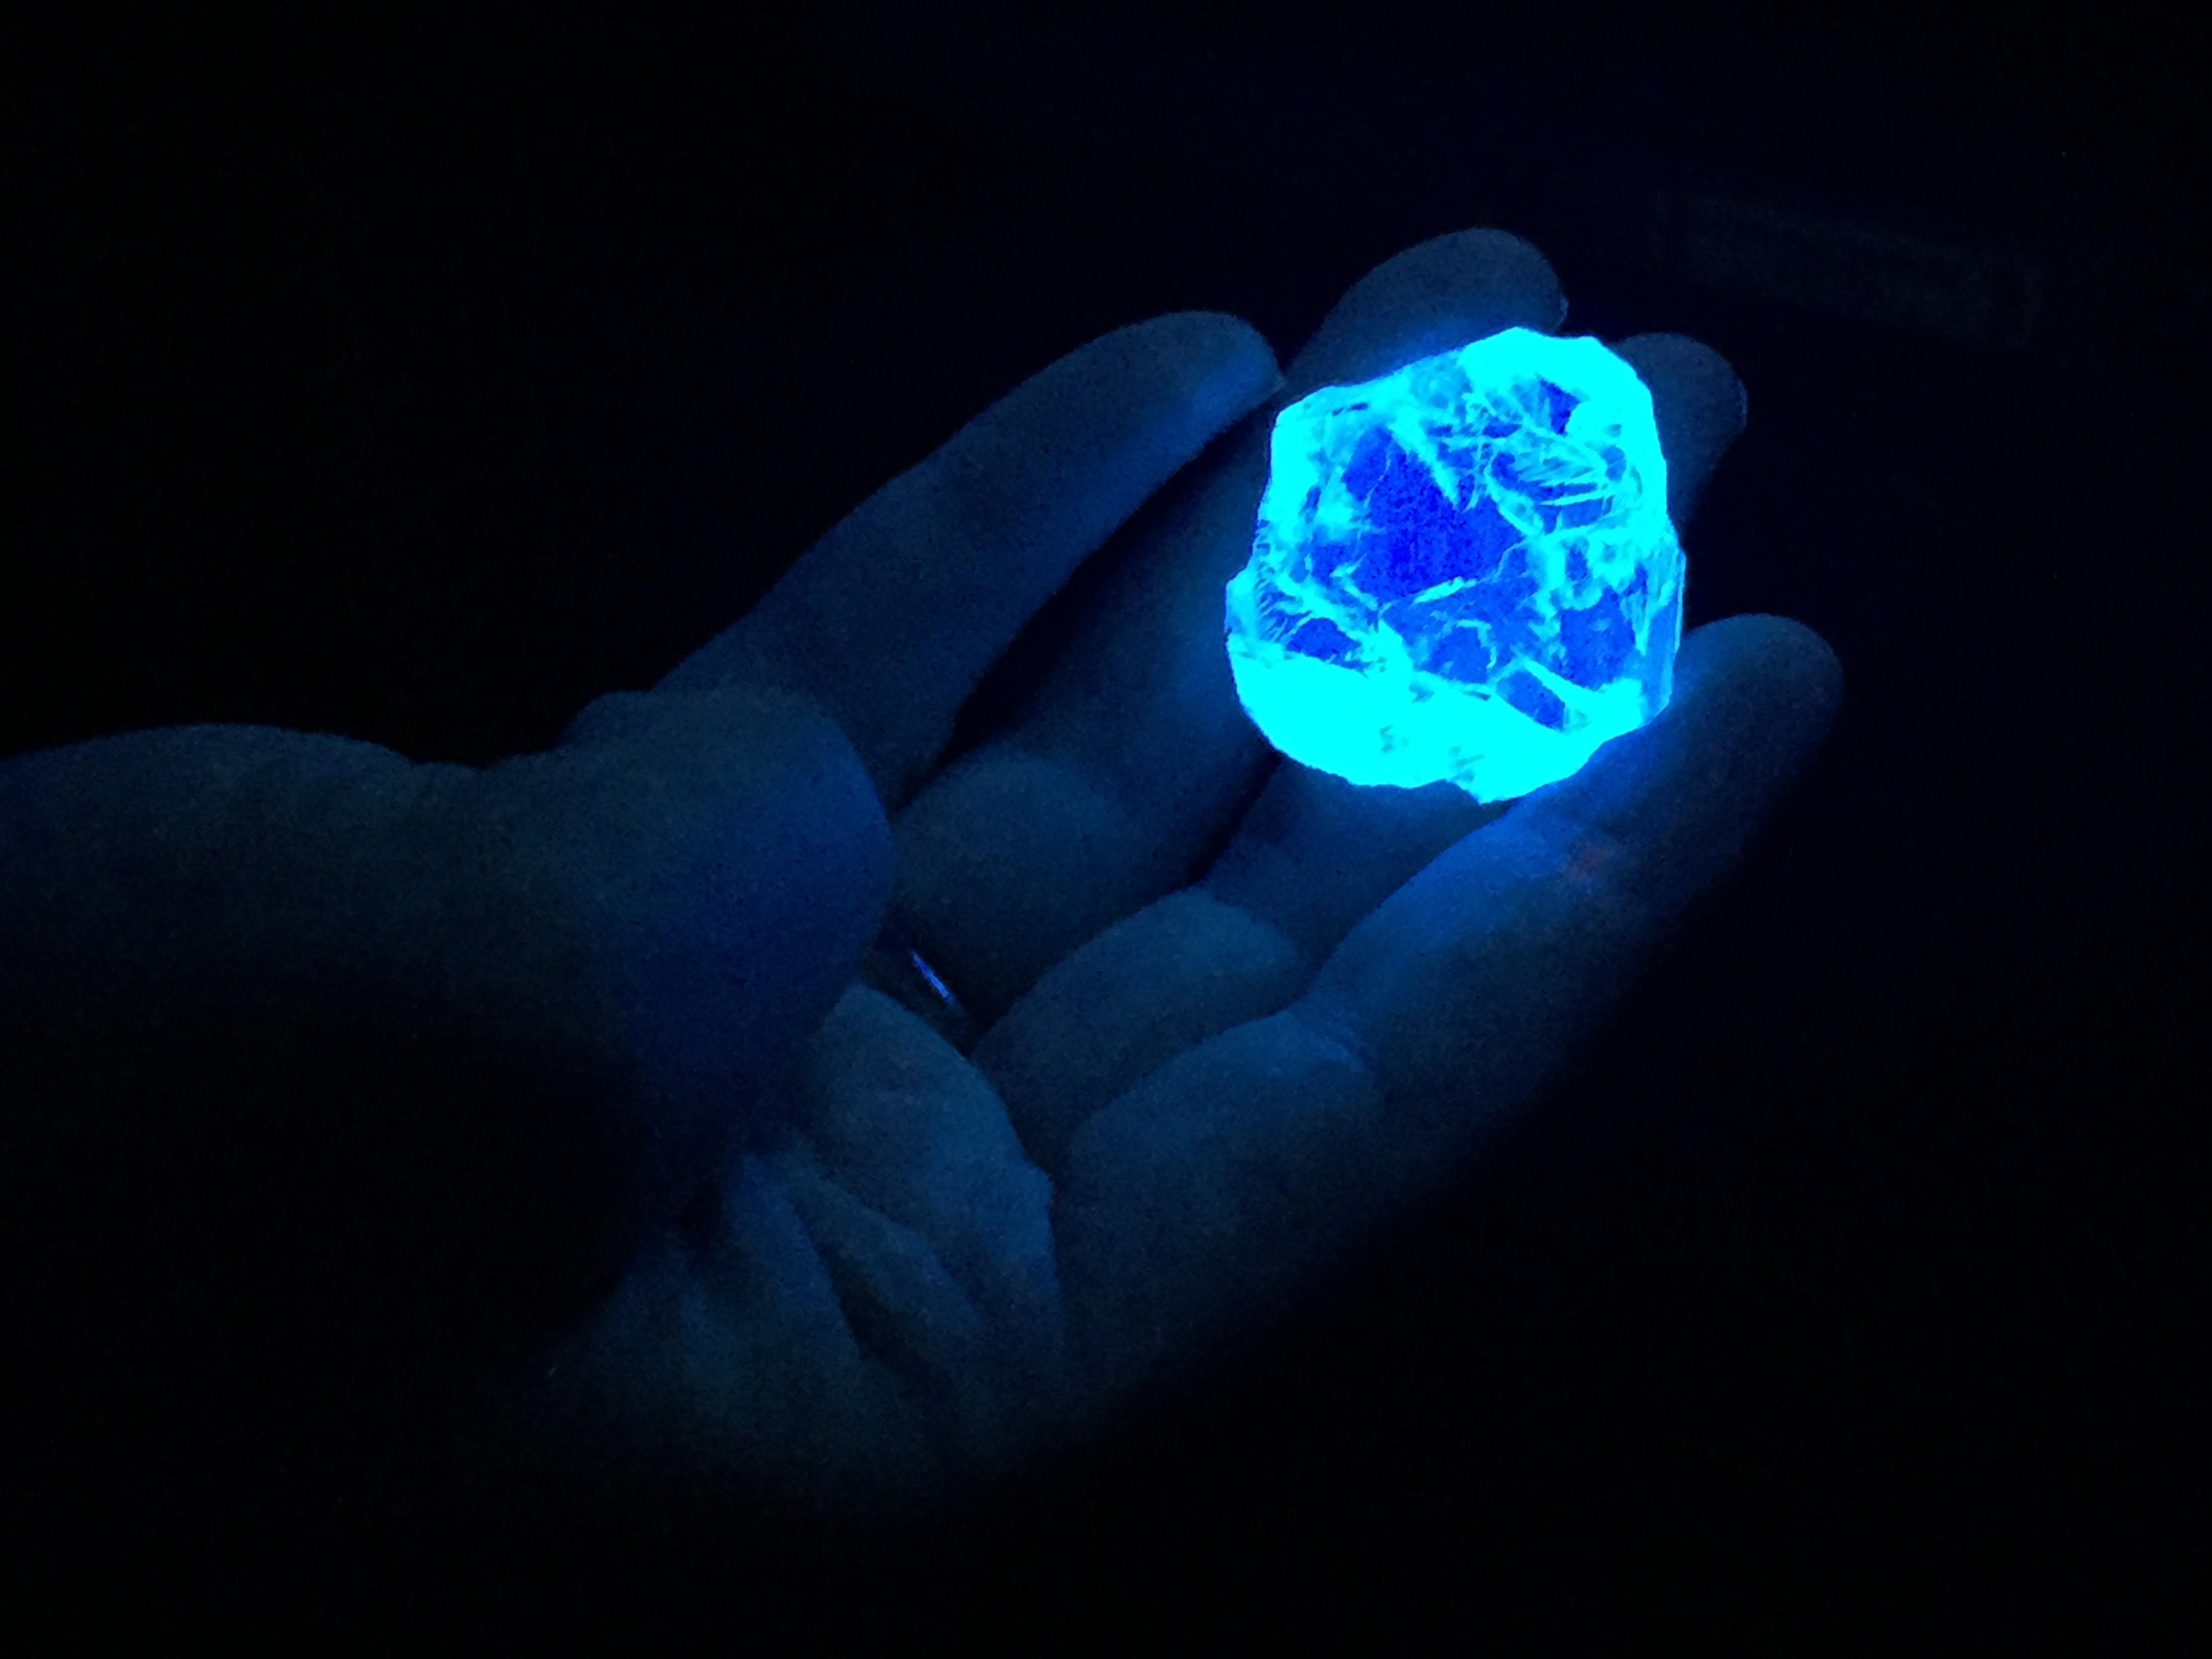 Colossal diamond's eerie glow earns it a fiery name